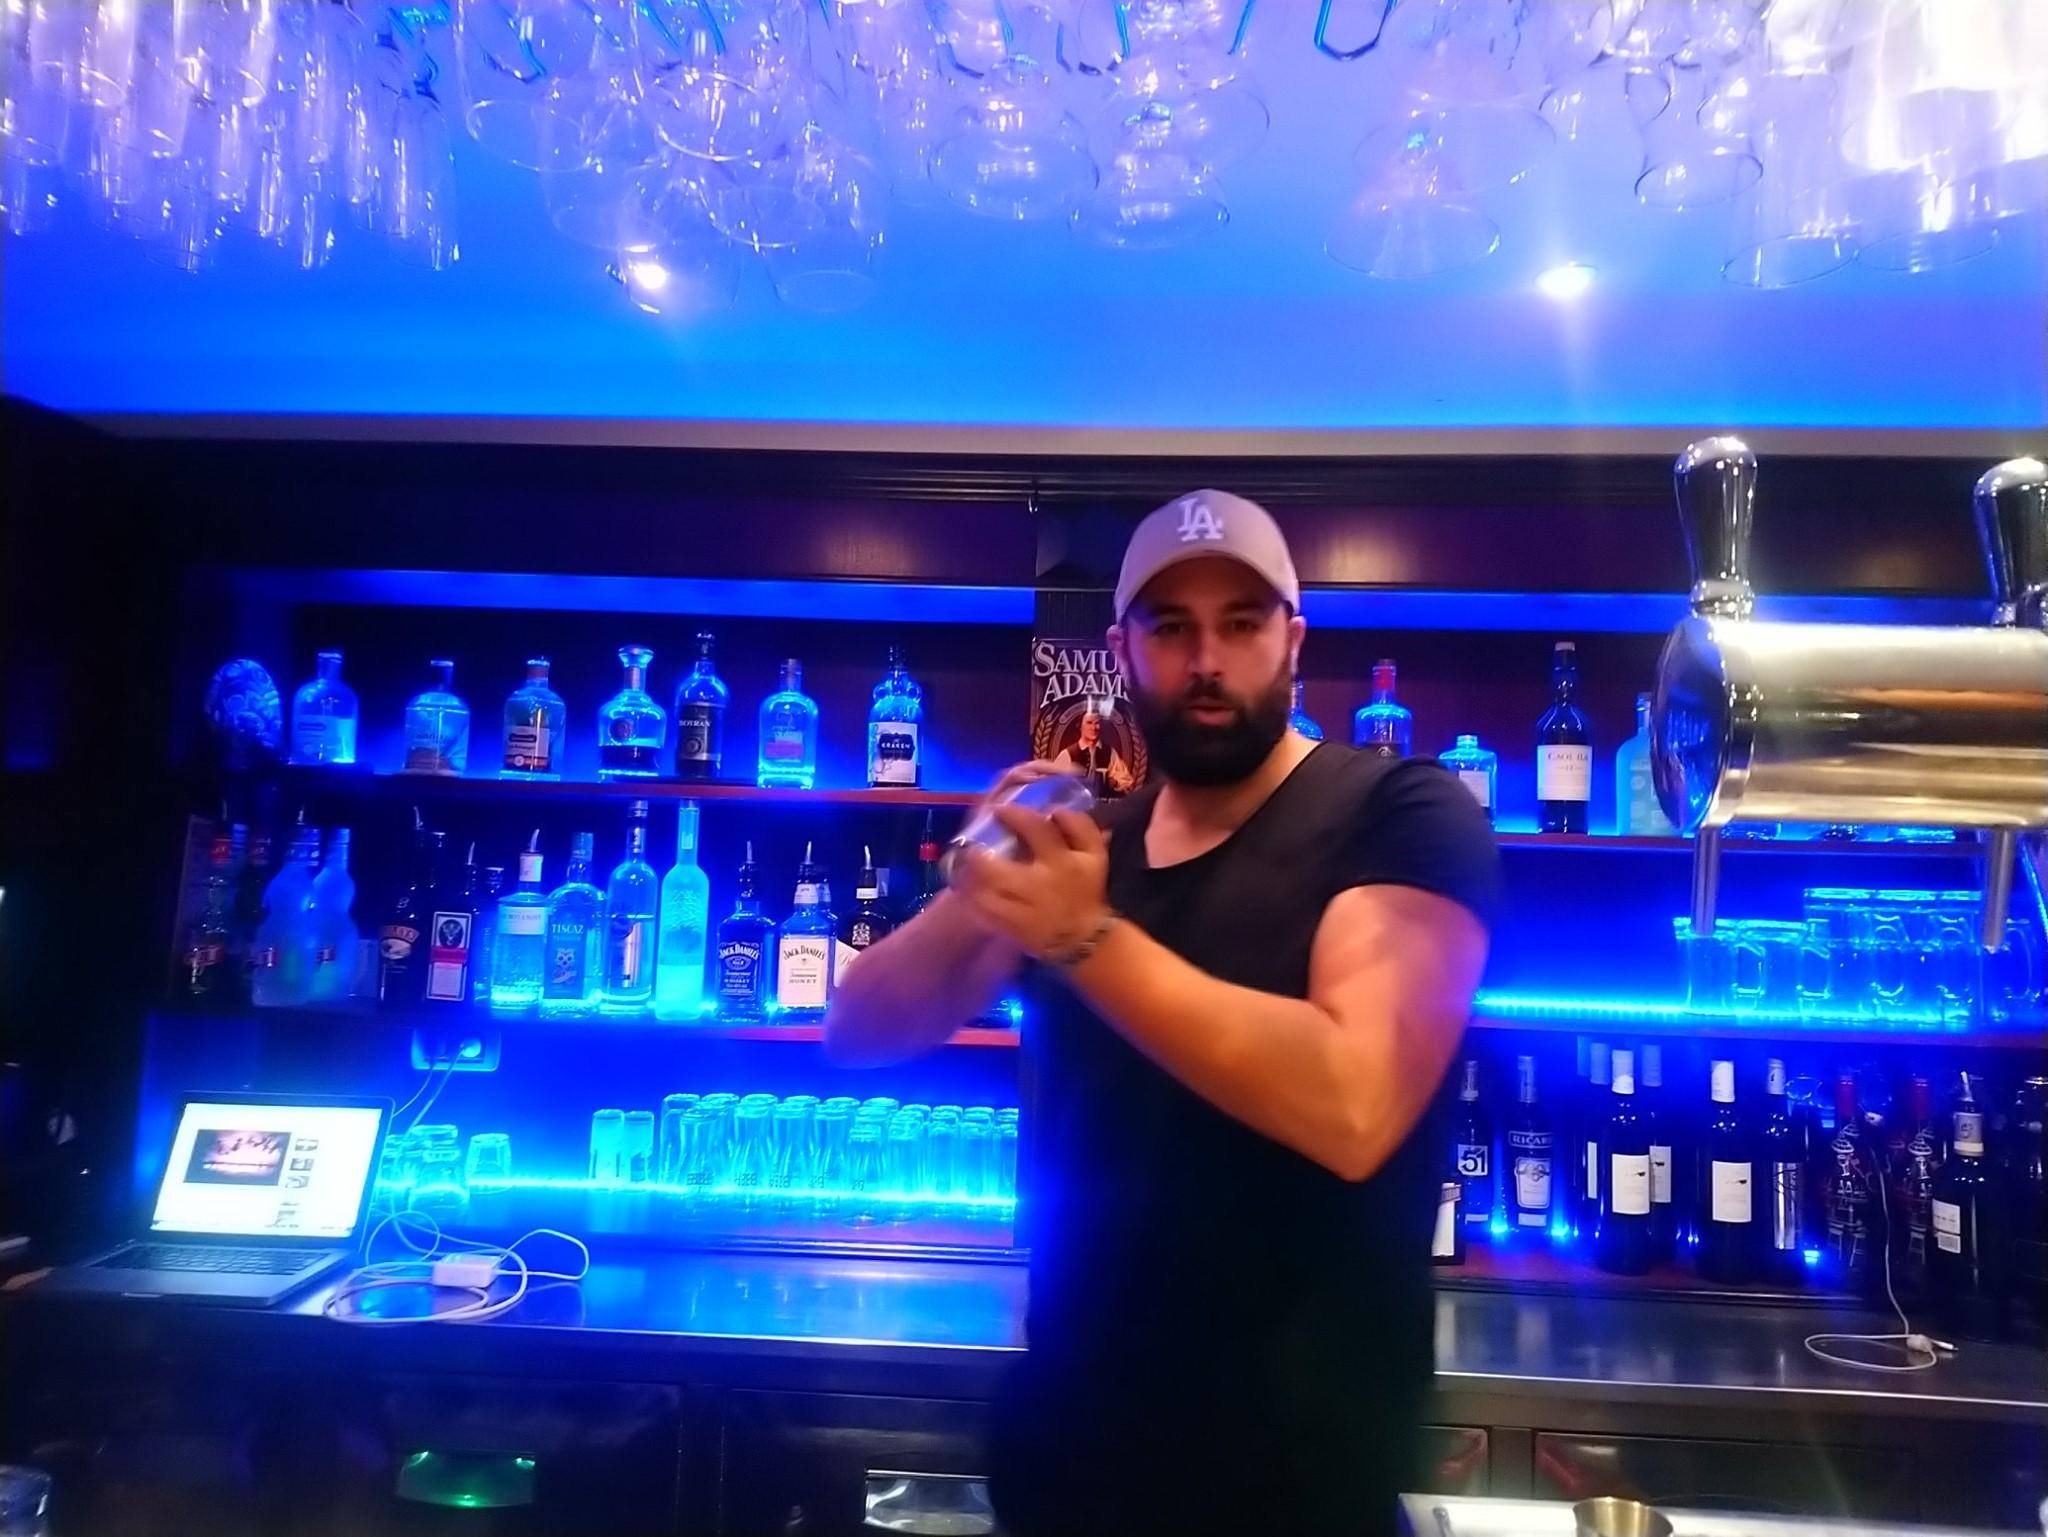 Millesim Pub Fréjus - Benjamin de Diego - Barman cocktails